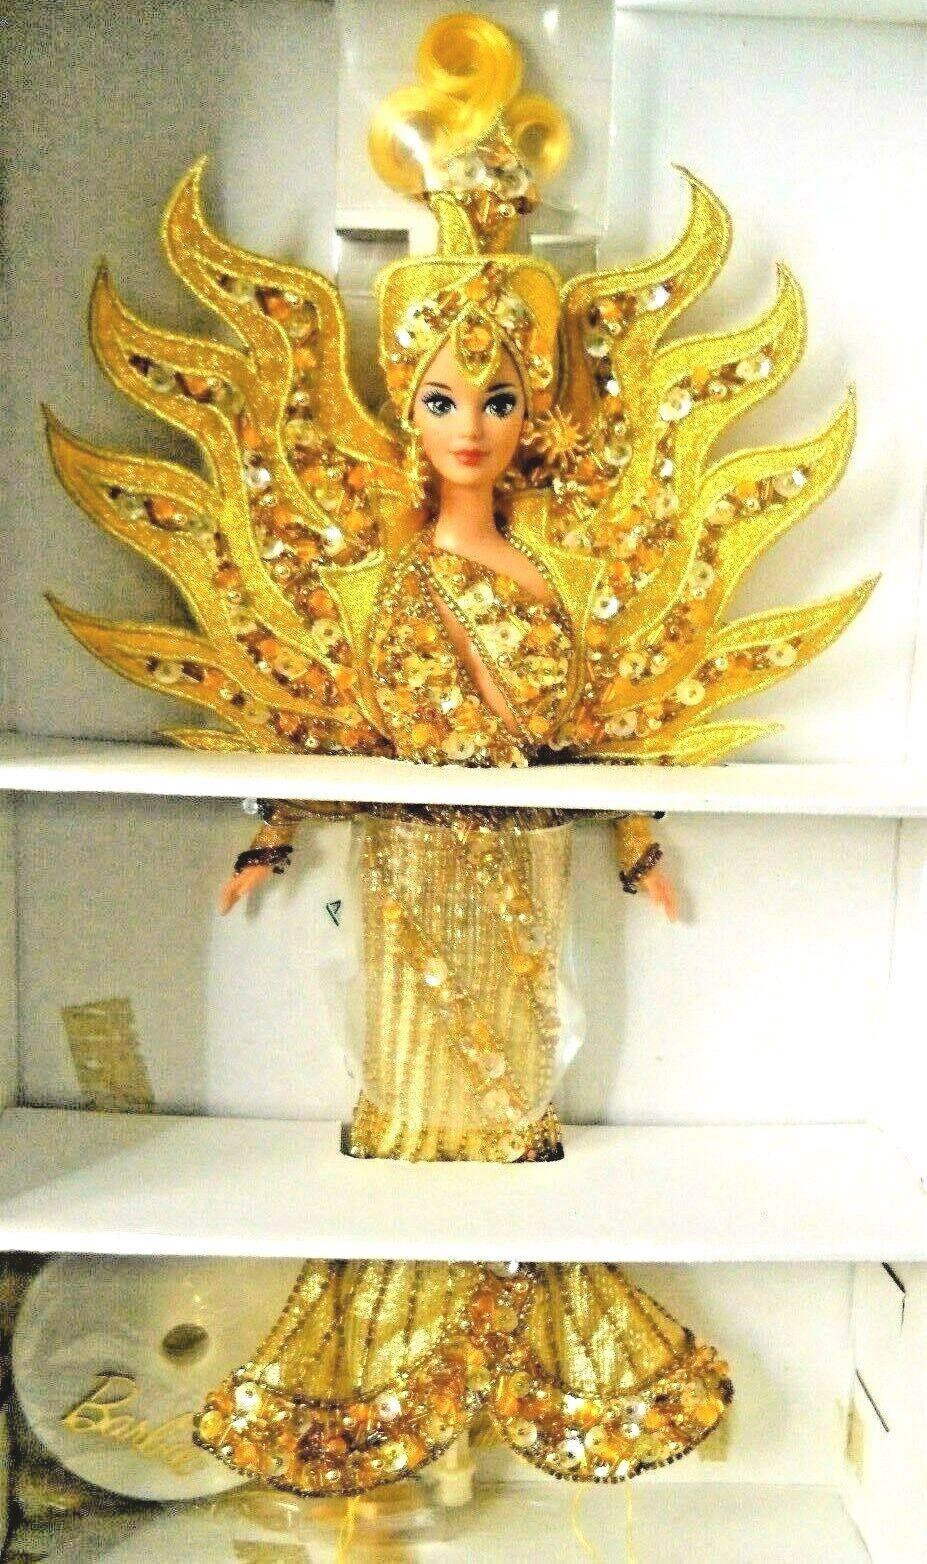 Bob Mackie 1995 diosa del Sol Barbie W Firmado Dibujo, Soporte, caja Original